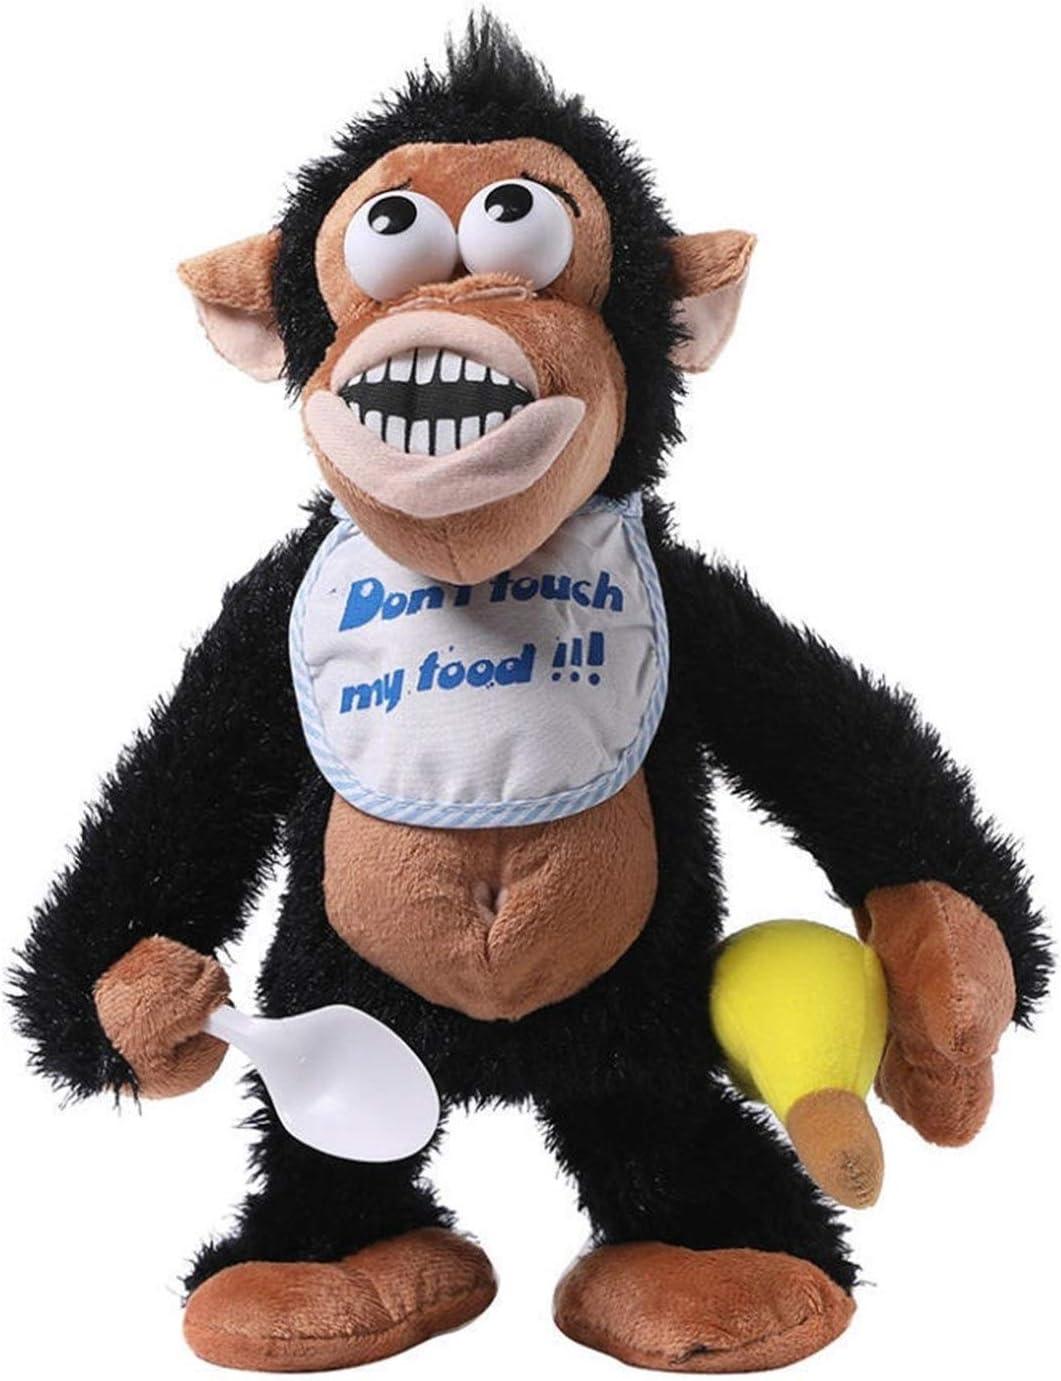 Wuyuana Plush Ranking TOP3 Toys Stuffed Max 75% OFF Animal Naughty Kids Crying Funny